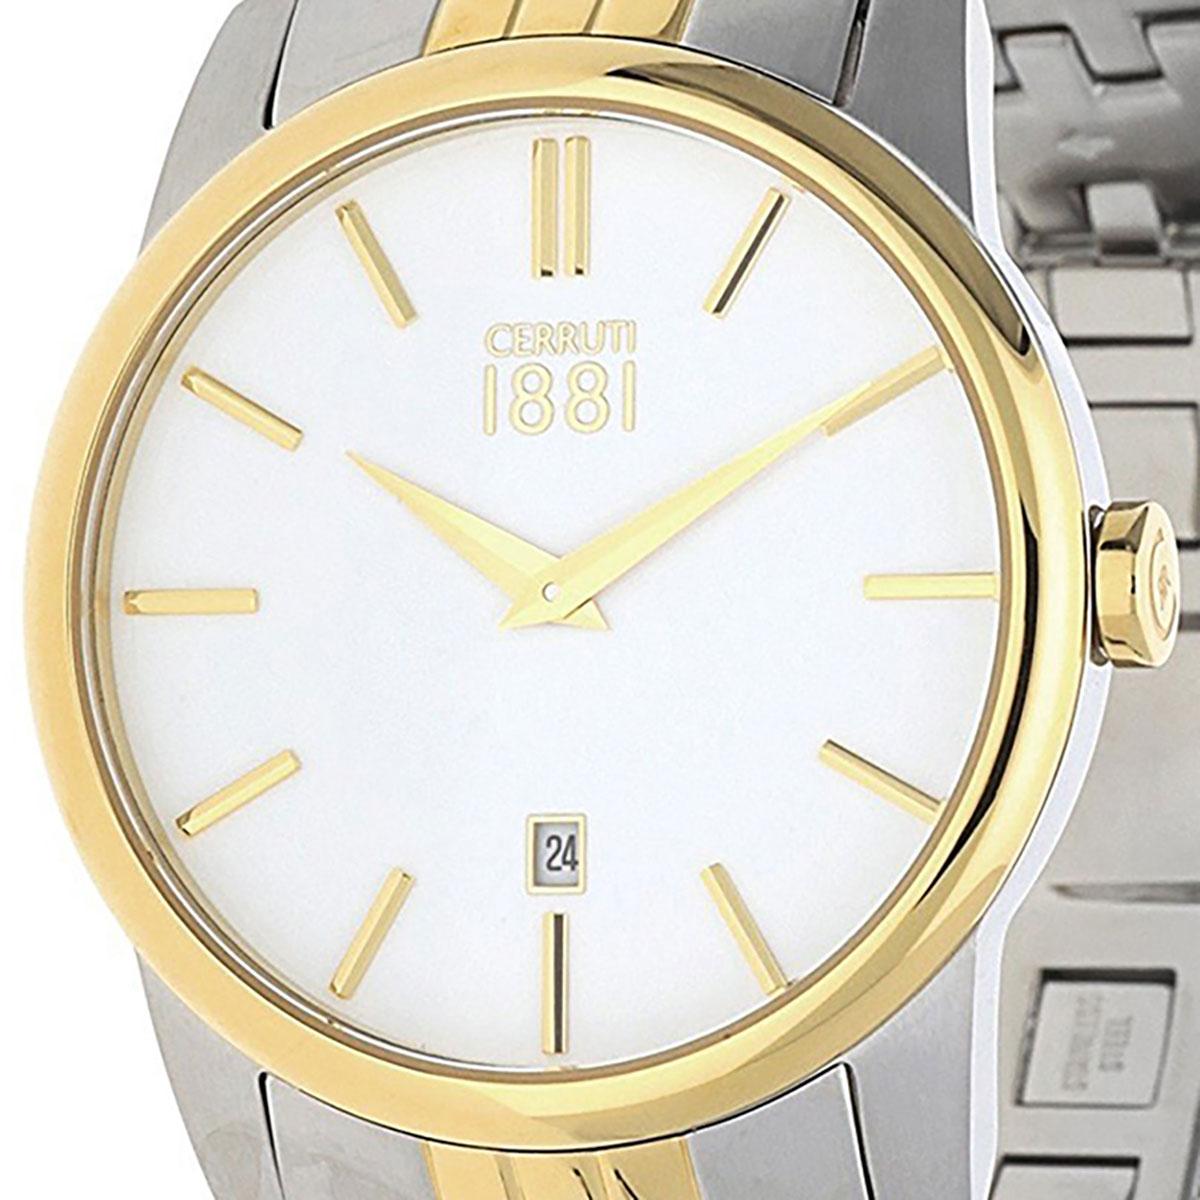 CERRUTI 1881 チェルッティ1881 電池式クォーツ 腕時計 [CRA117STG01MGT] 並行輸入品 ホワイト(白)